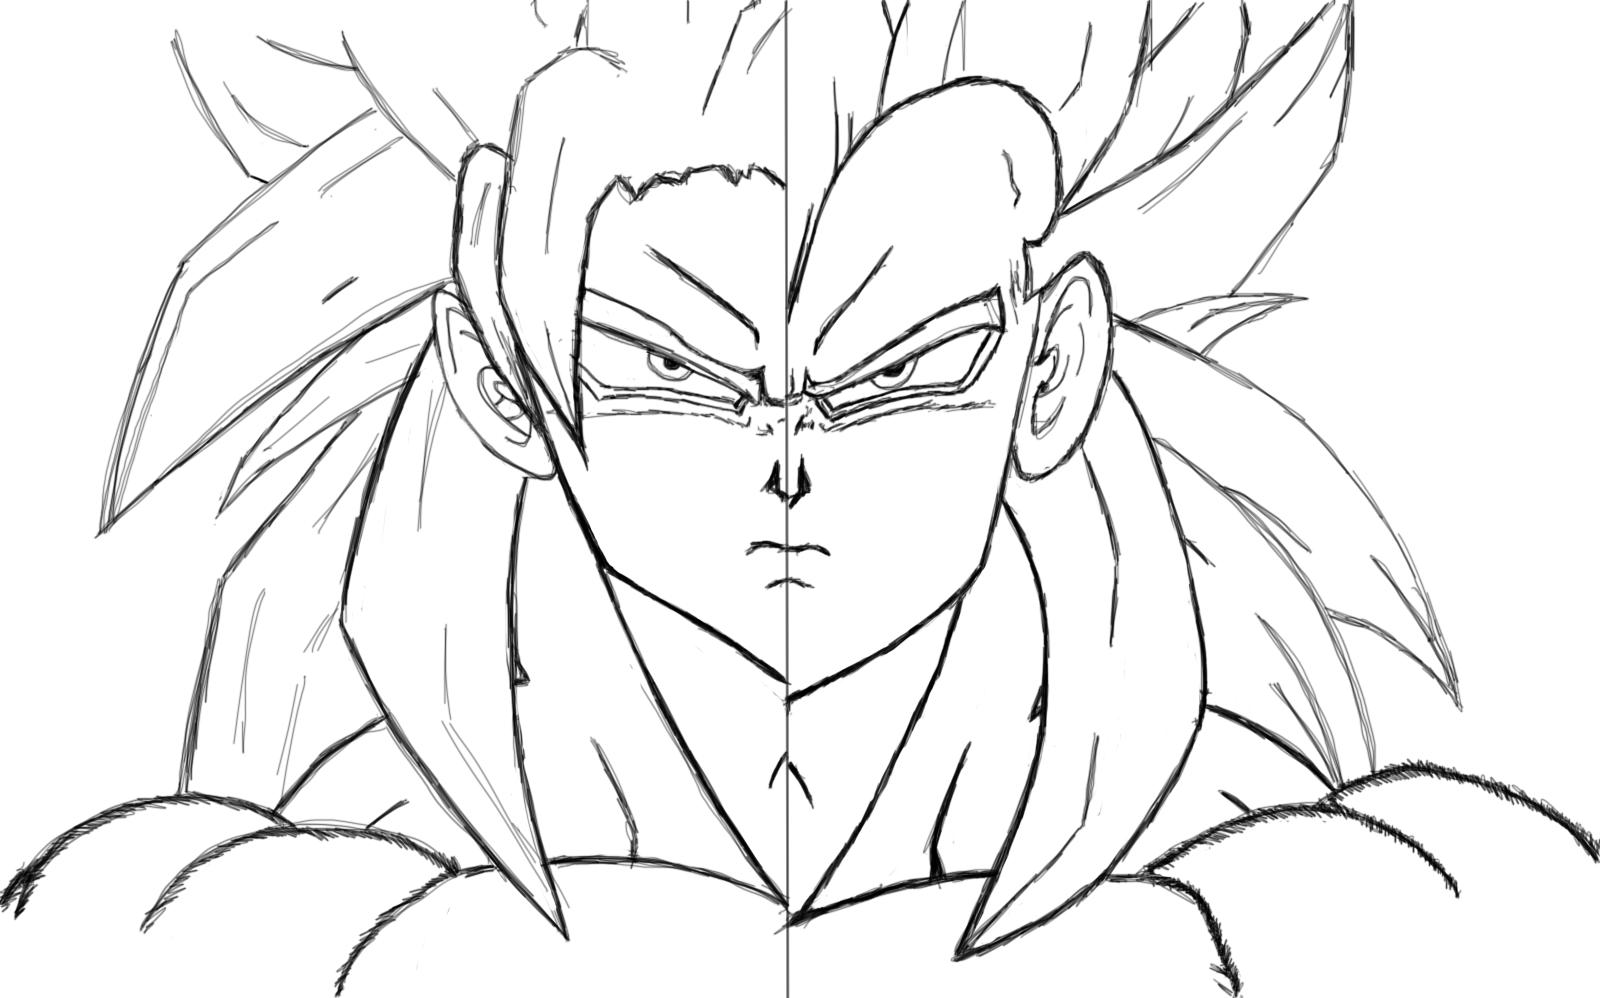 Vegeta Para Colorear Baby Para Goku Y Vegeta Para Pintar: Goku Vegeta Ssj4 Outline By NightmareItachi On DeviantArt